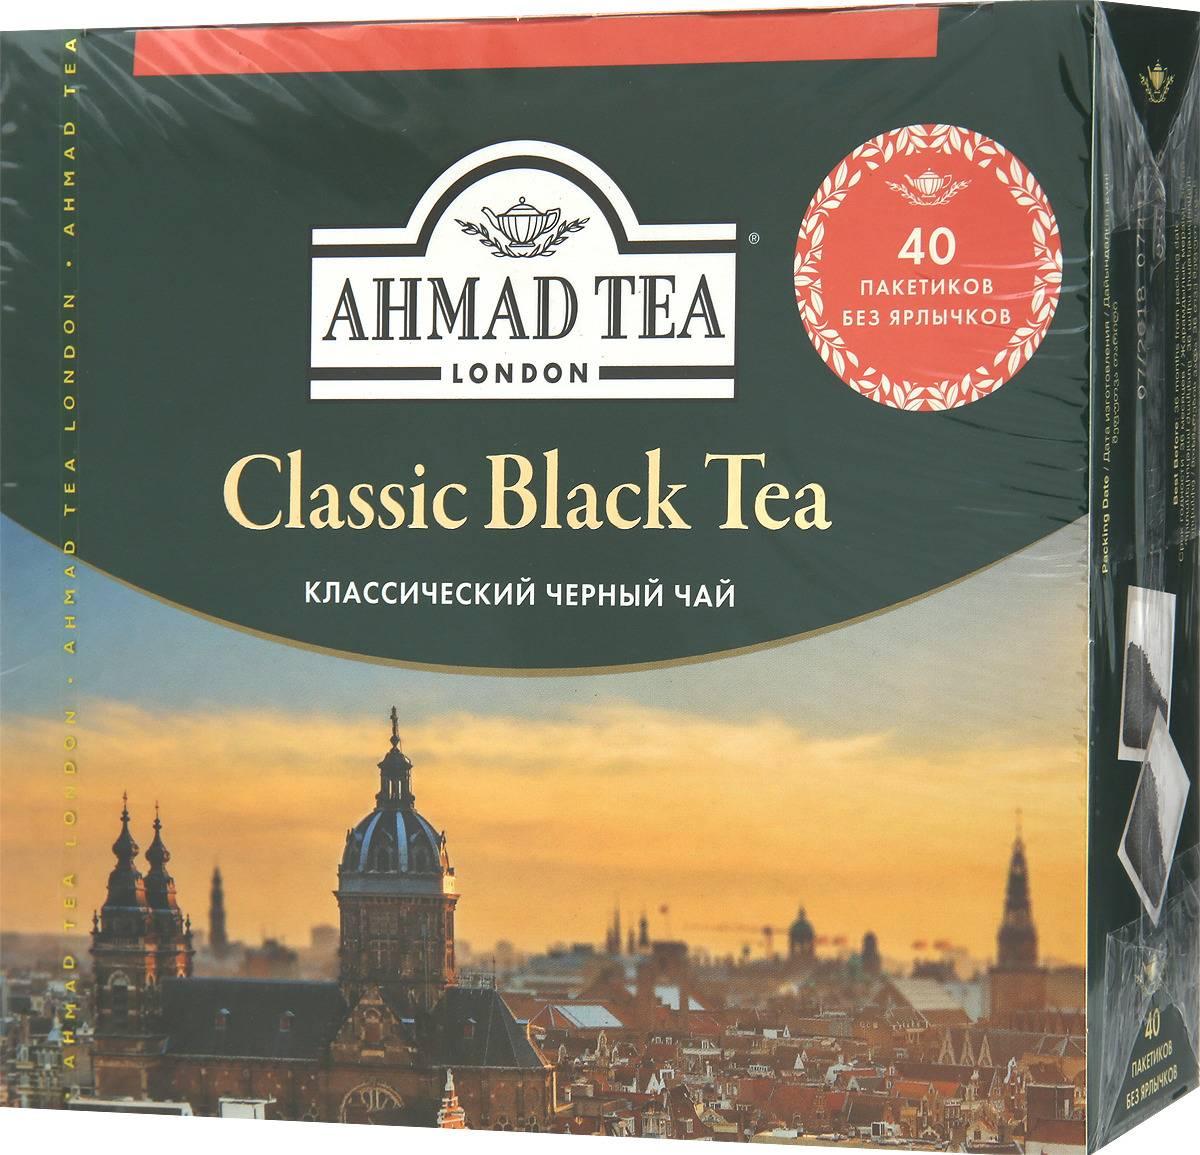 Чай ахмад: официальный сайт компании